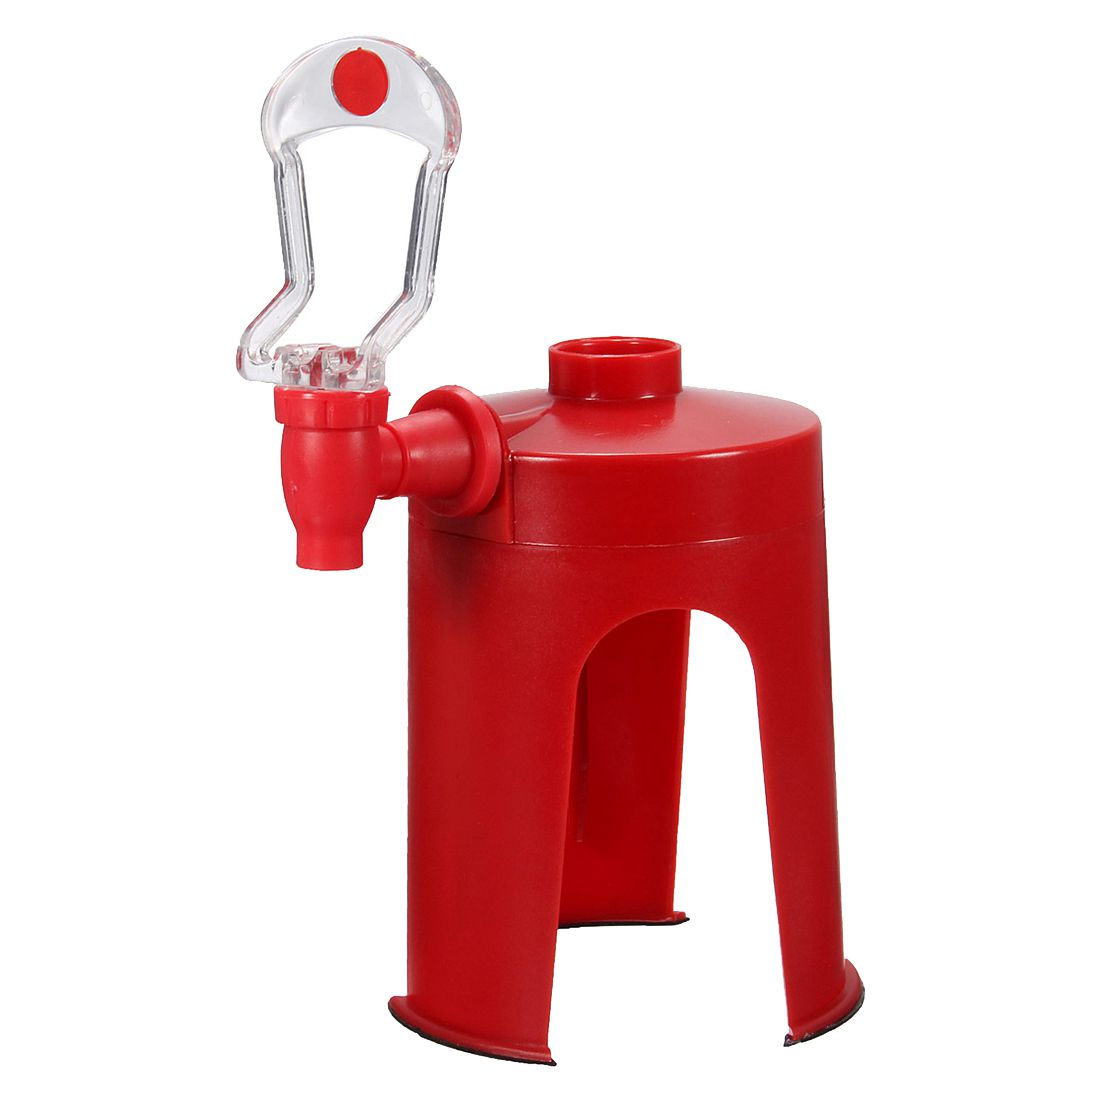 Soda Dispenser Fizz Dispenser Drink Dispenser Water Dispenser Party Cola Sprite, Red двухколесные самокаты micro sprite se